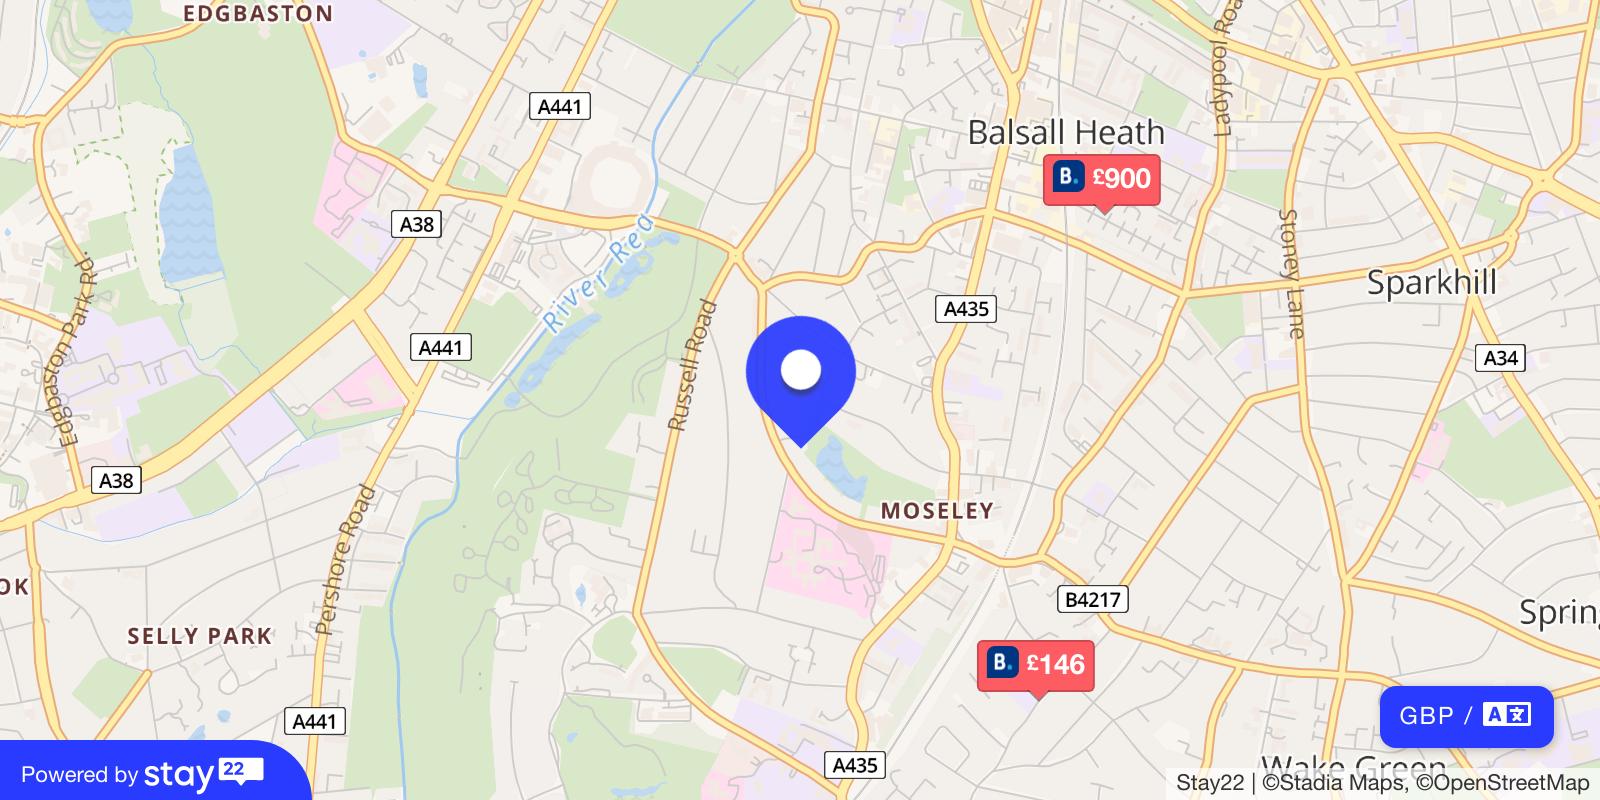 Moseley Park & Pool